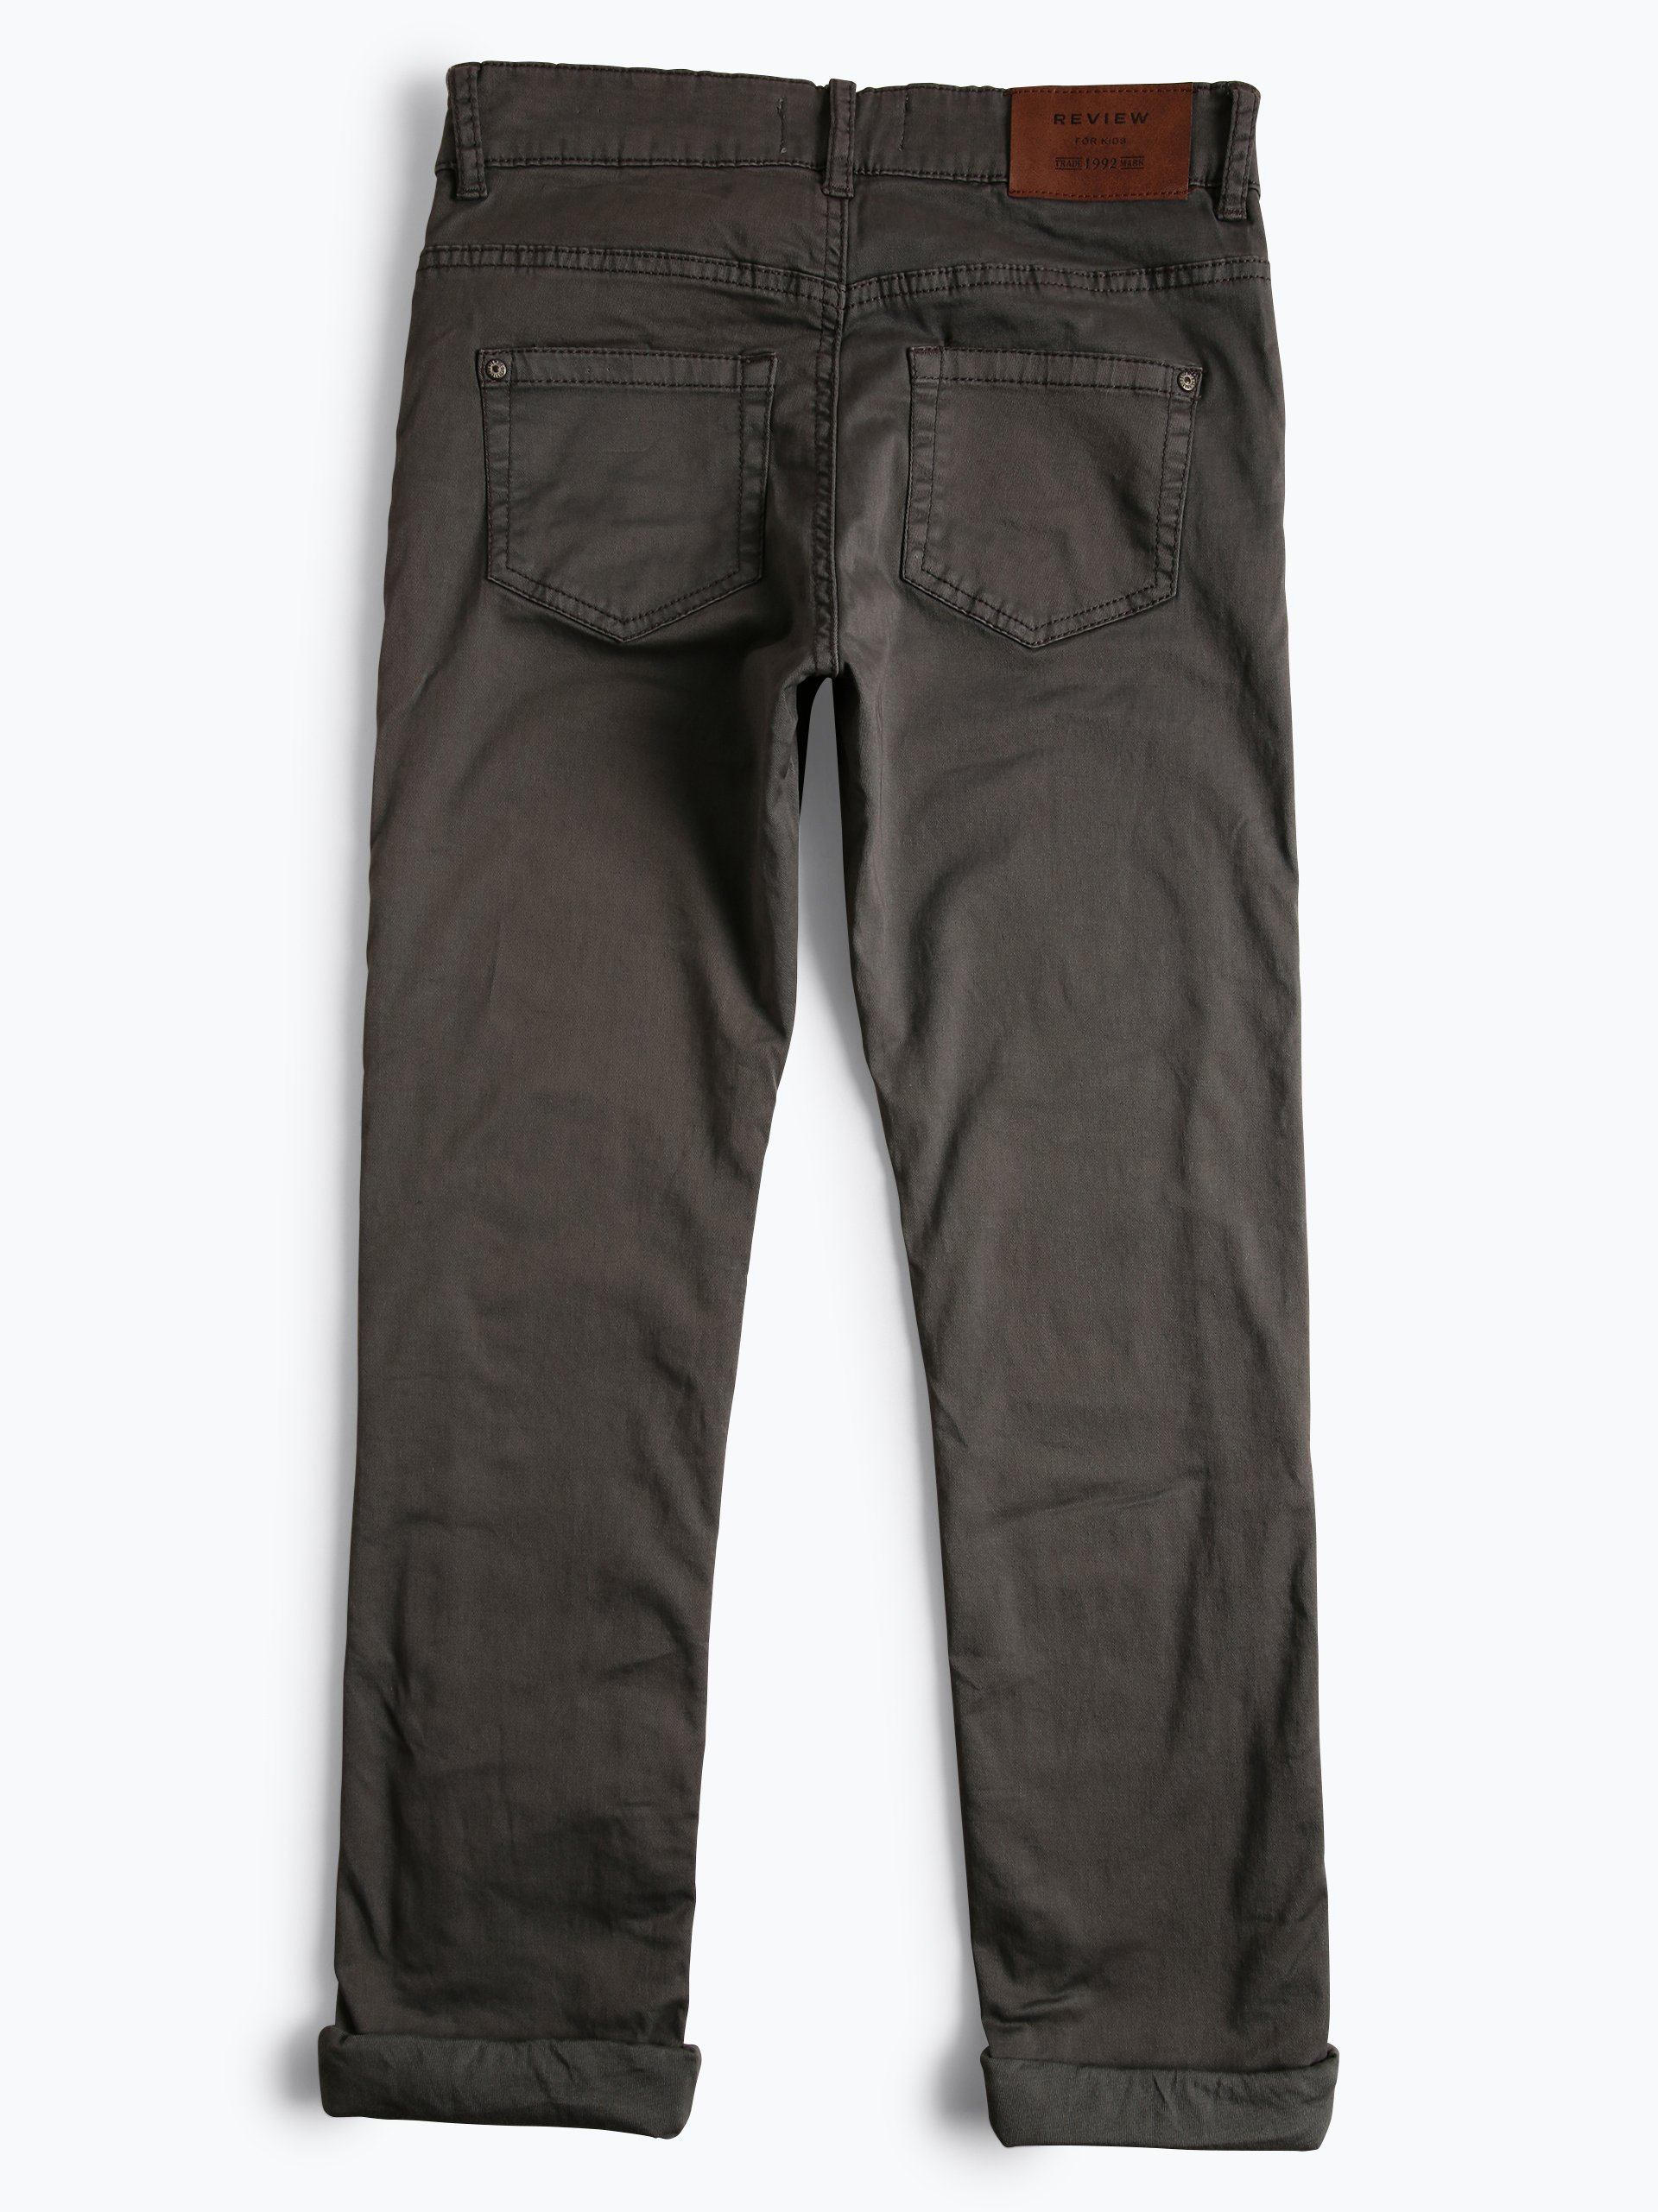 Review Jungen Hose Slim Fit